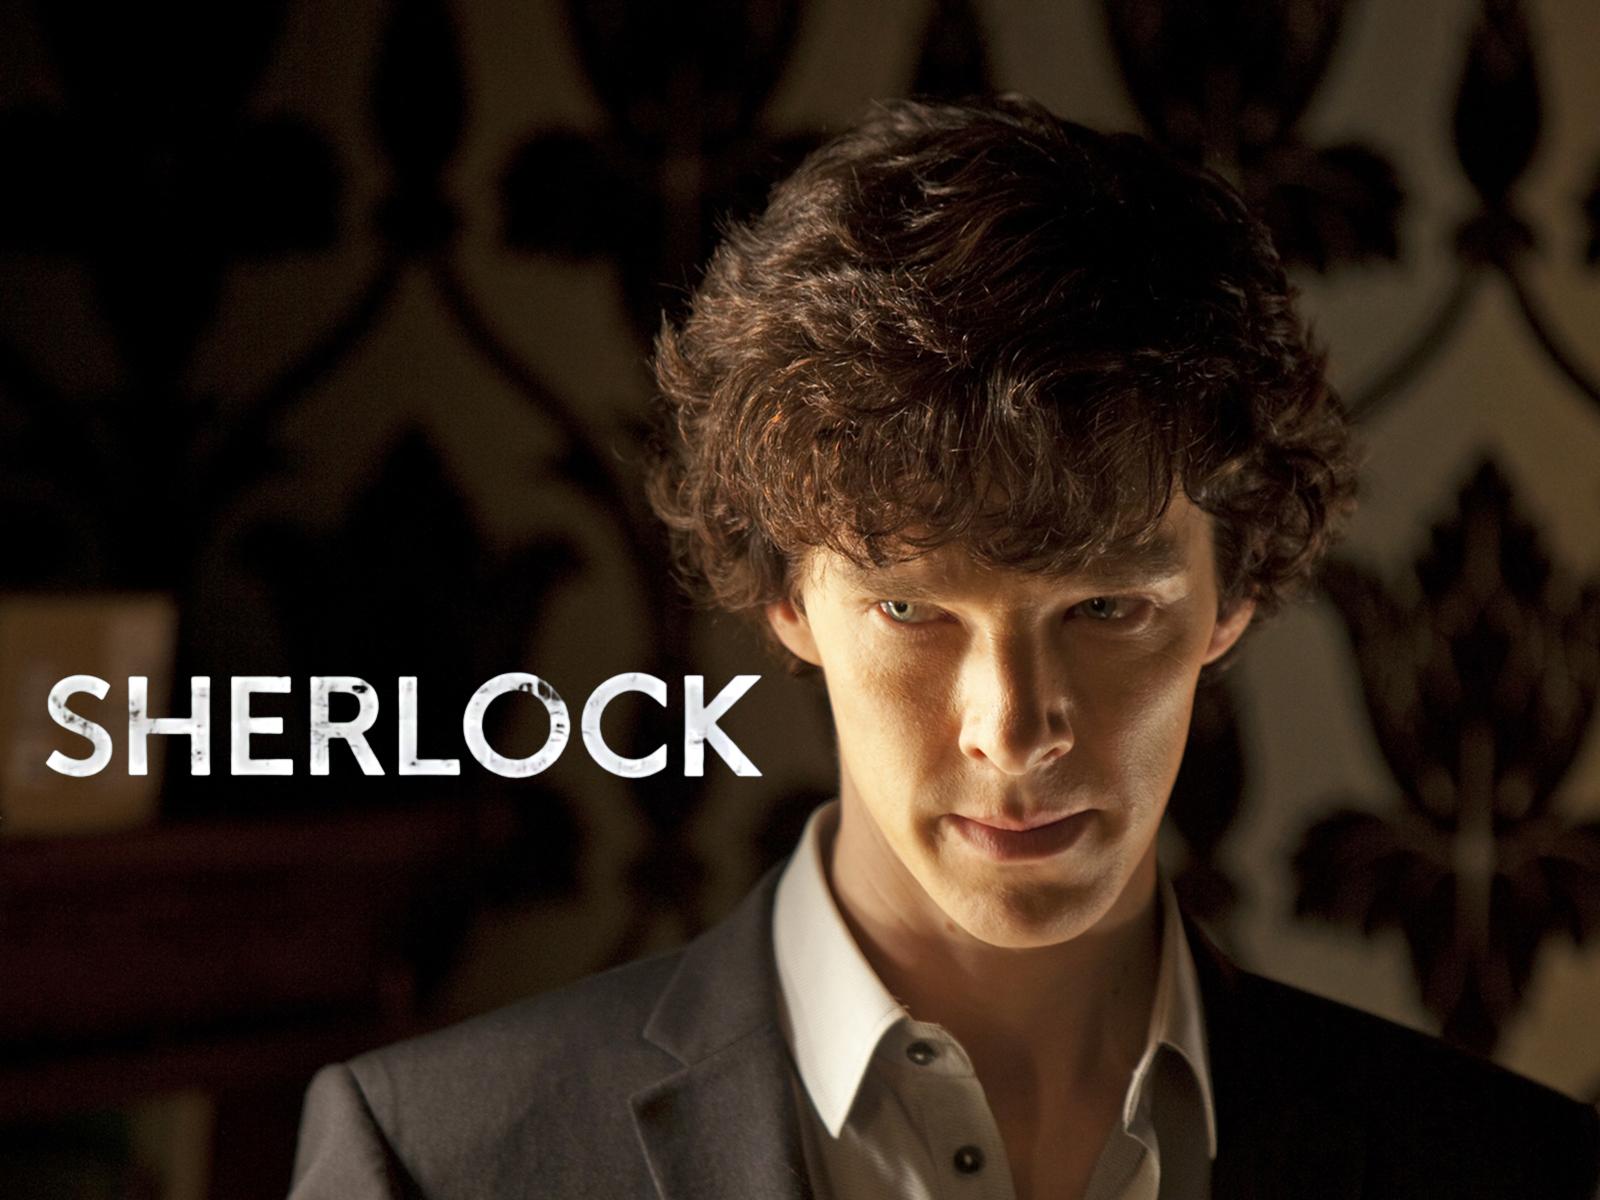 sherlock tv series wallpaper - photo #15